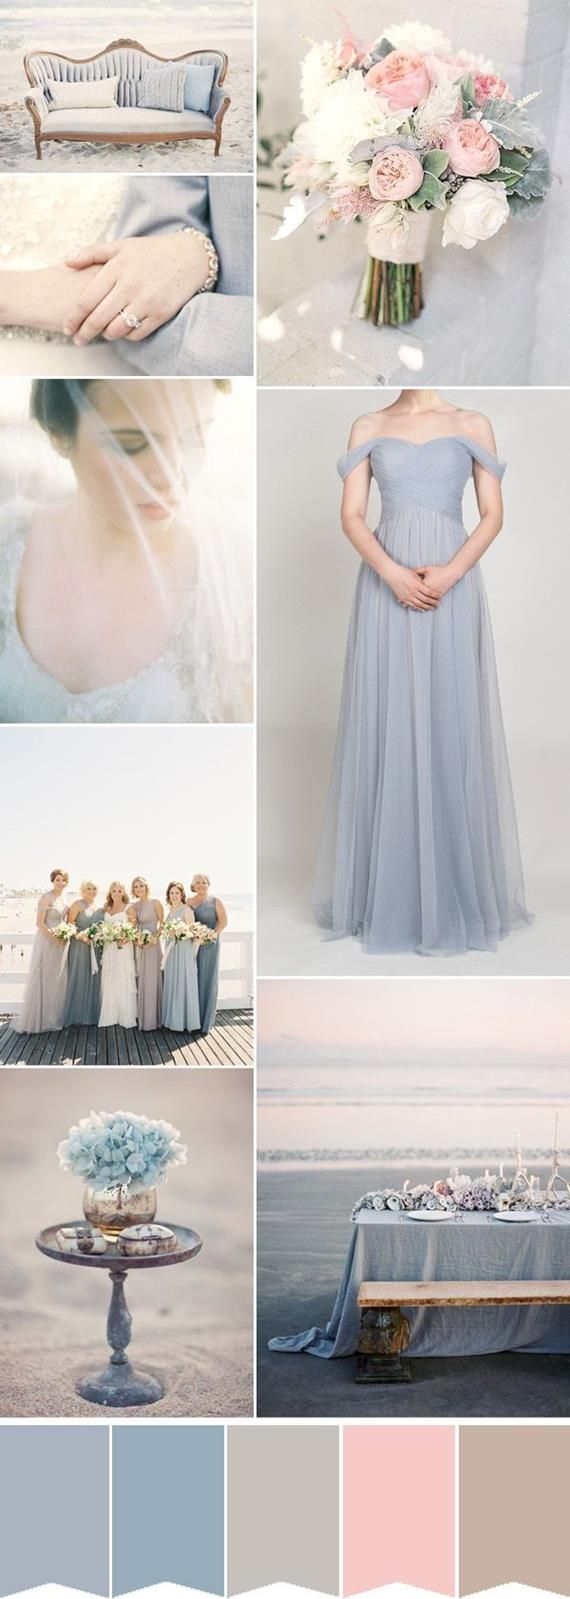 Romantic dustry blue beach wedding ideas | My Wedding | Pinterest ...